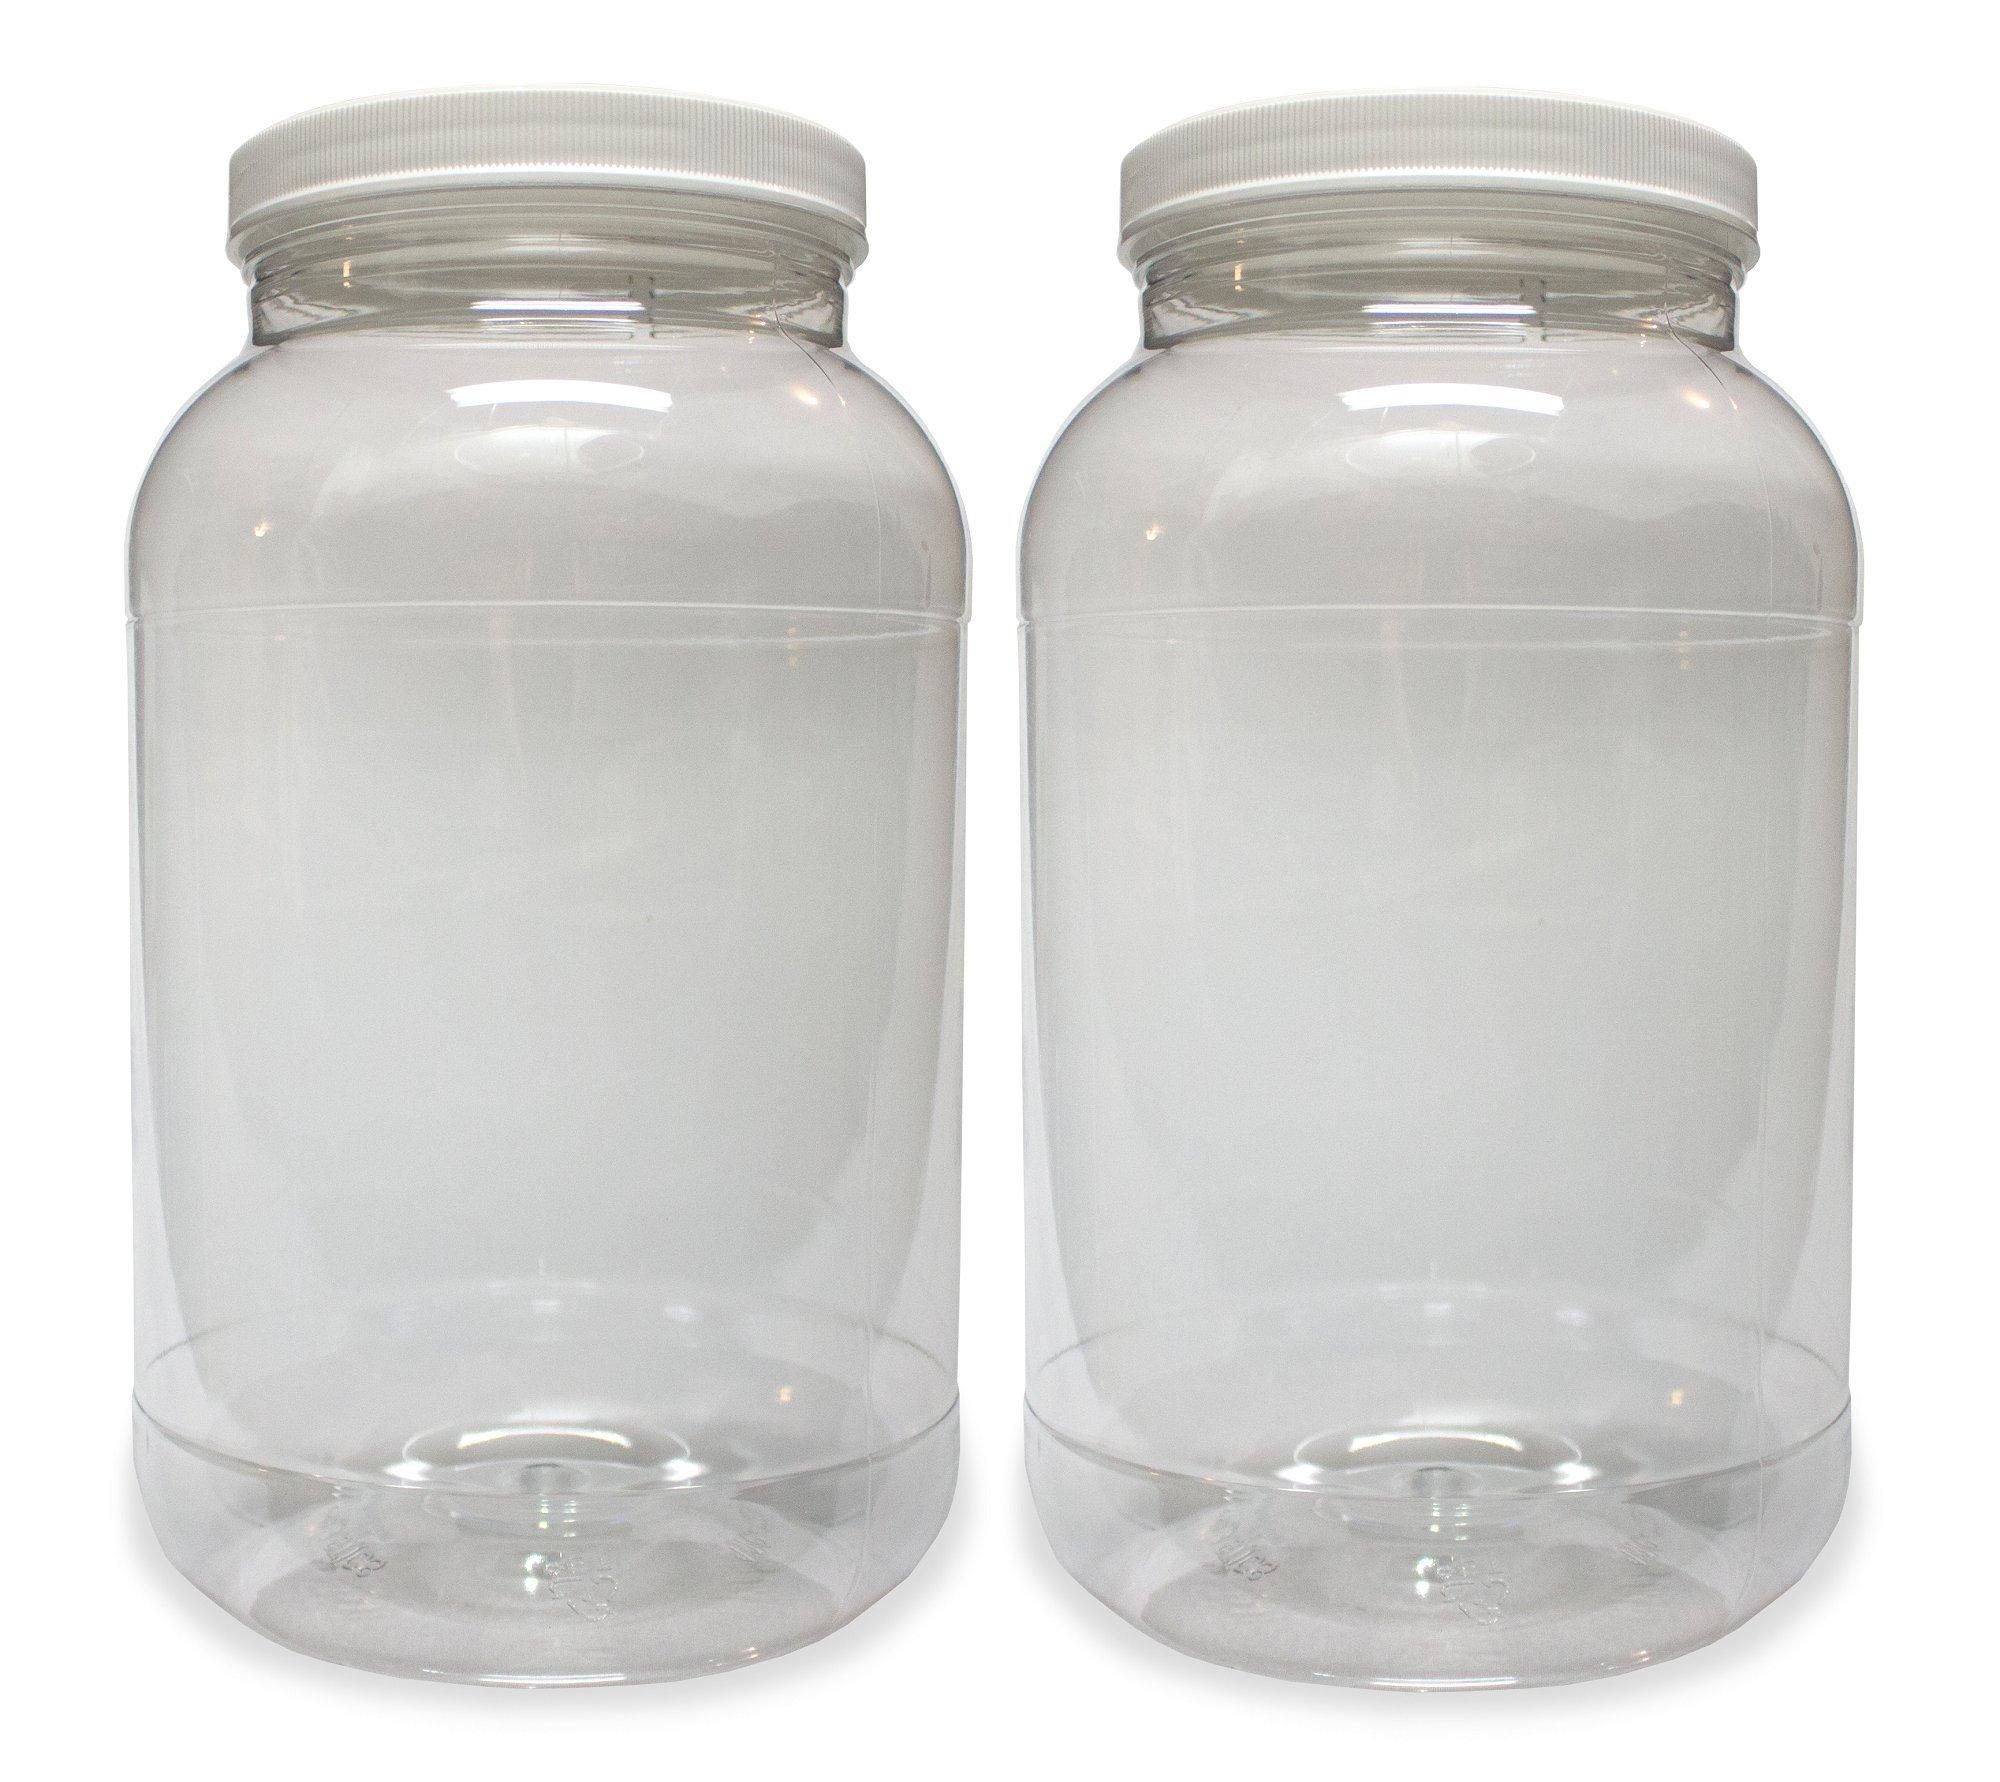 32abf40df0a Buy 1 Gallon Plastic Jar (2 Pack)